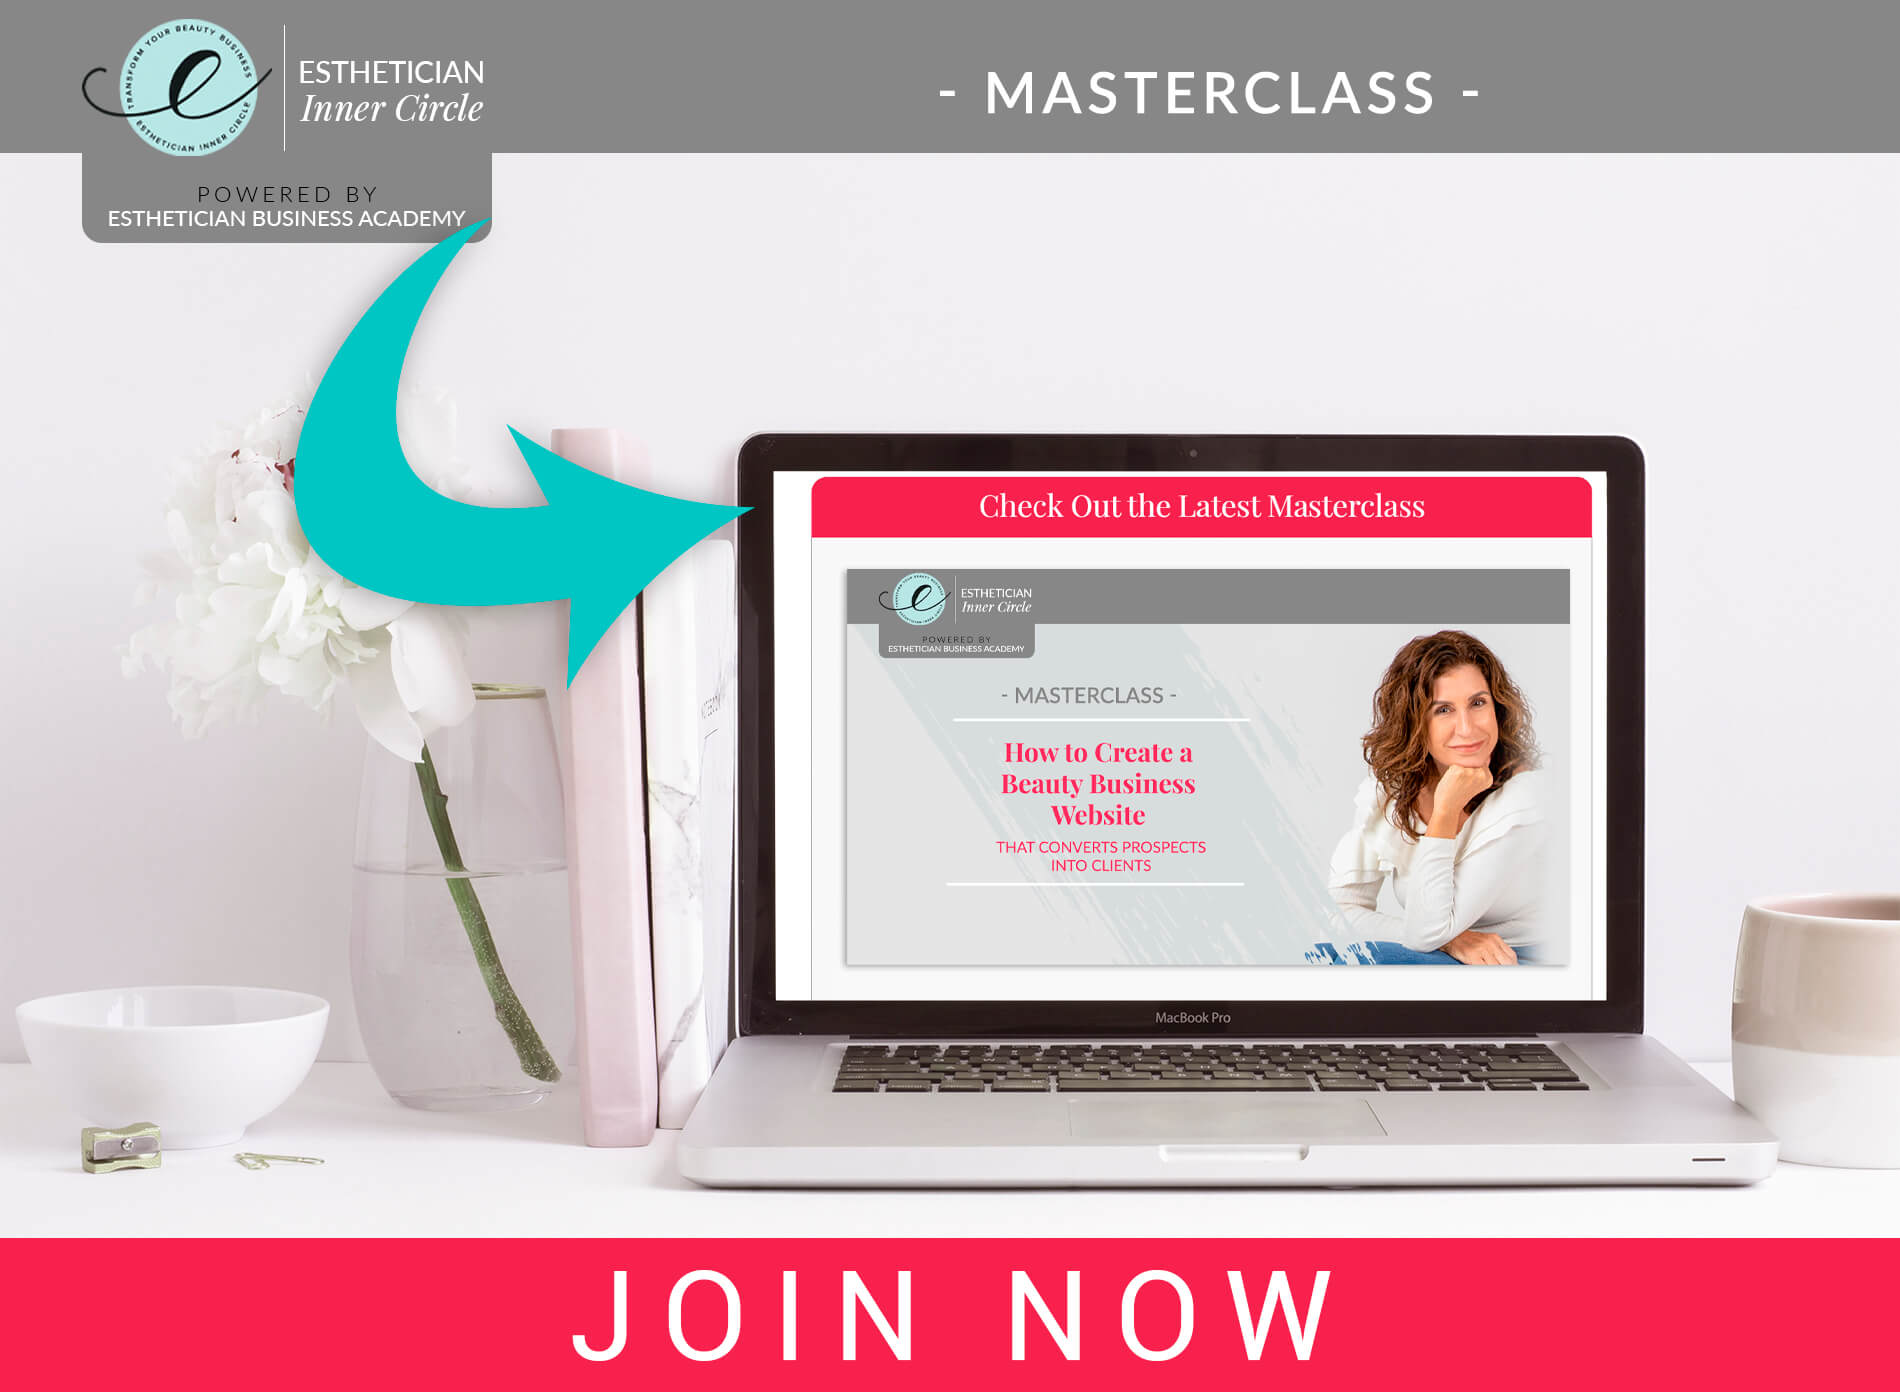 eic mockup beauty business website masterclass